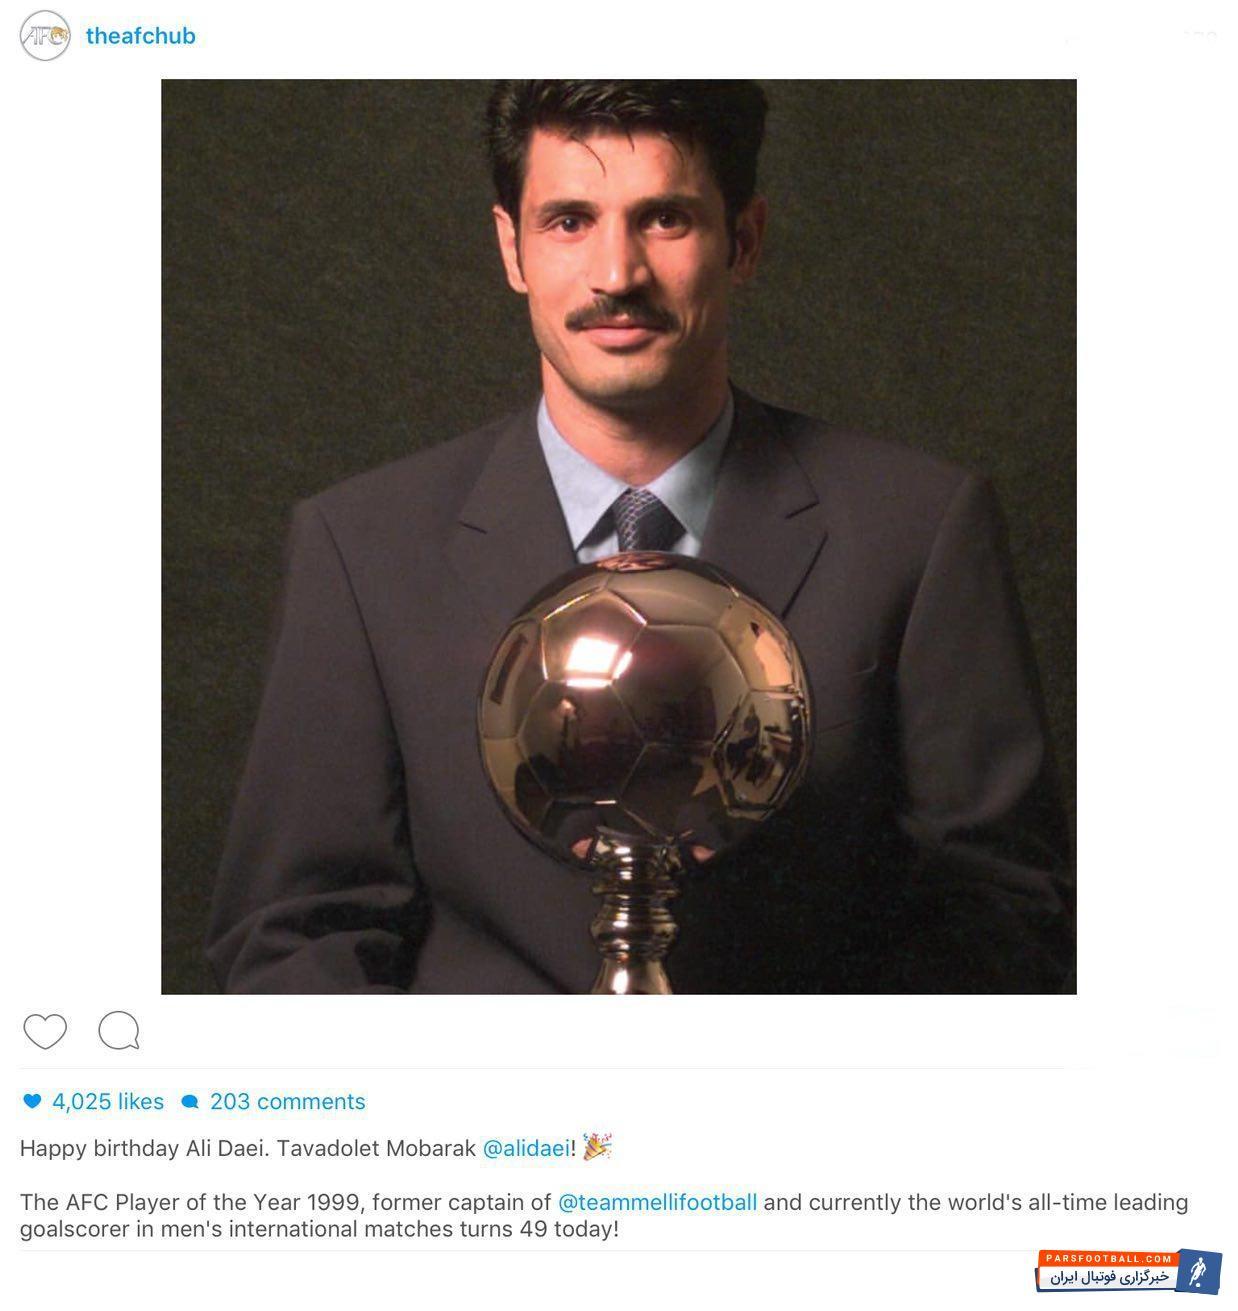 عکس ؛ پیام تبریک AFC به علی دایی